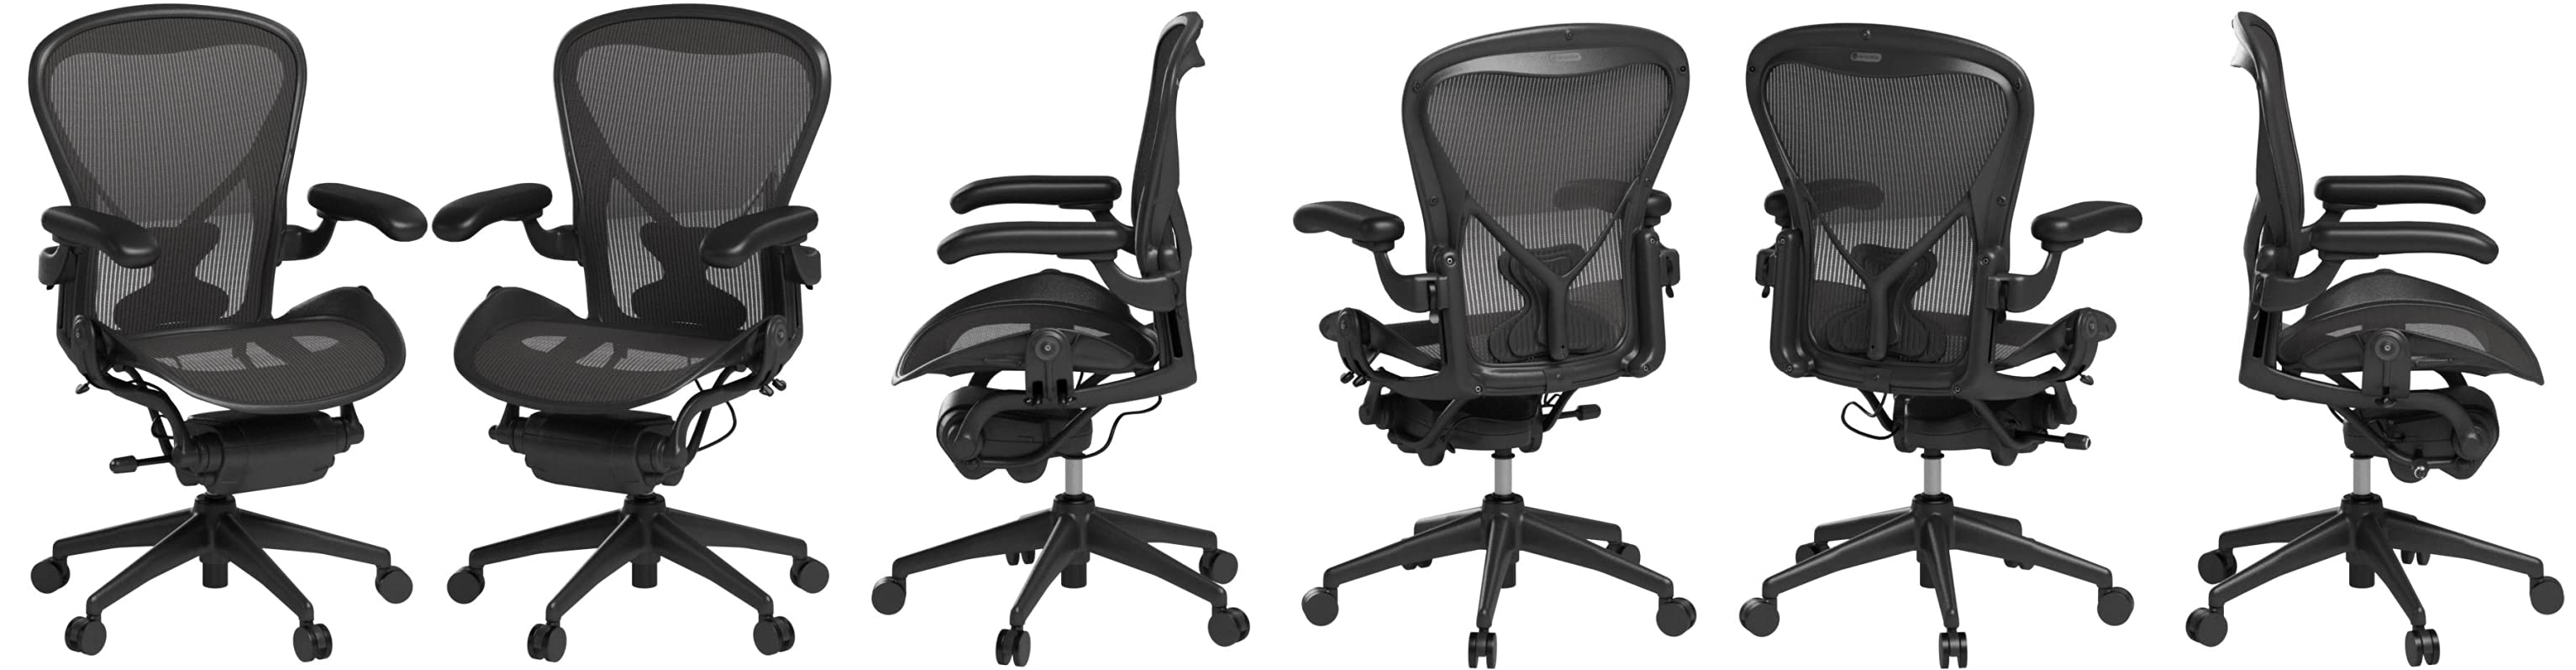 best-price-herman-miller-aeron-chair